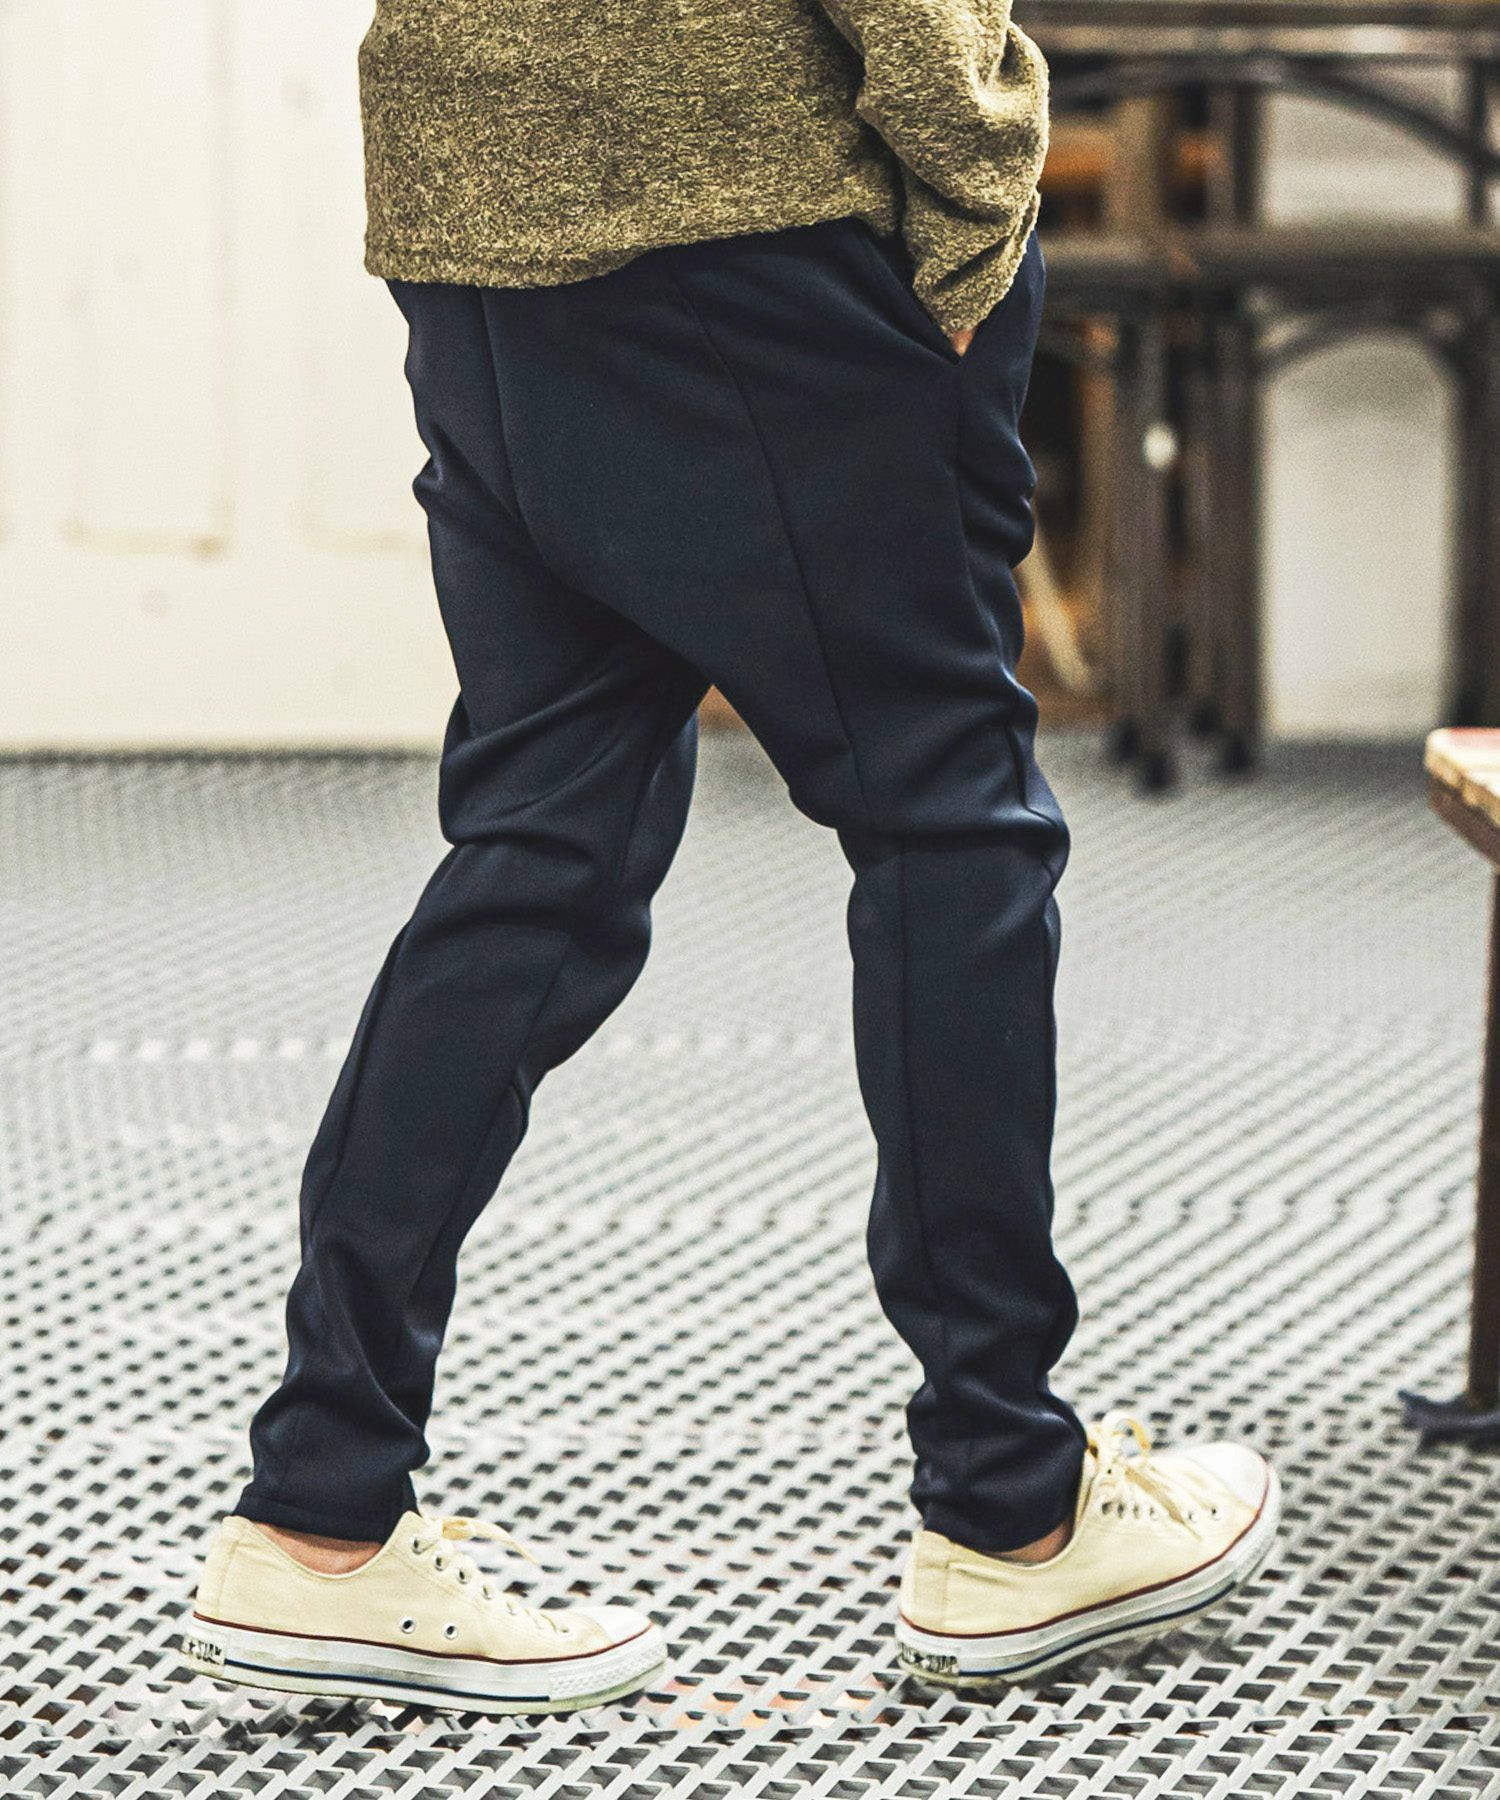 【CAMBIO(カンビオ)】【予約販売11月中旬~下旬入荷予定】Ponti Sarrouel Easy Pants イージーパンツ(CAM21AW-013 )